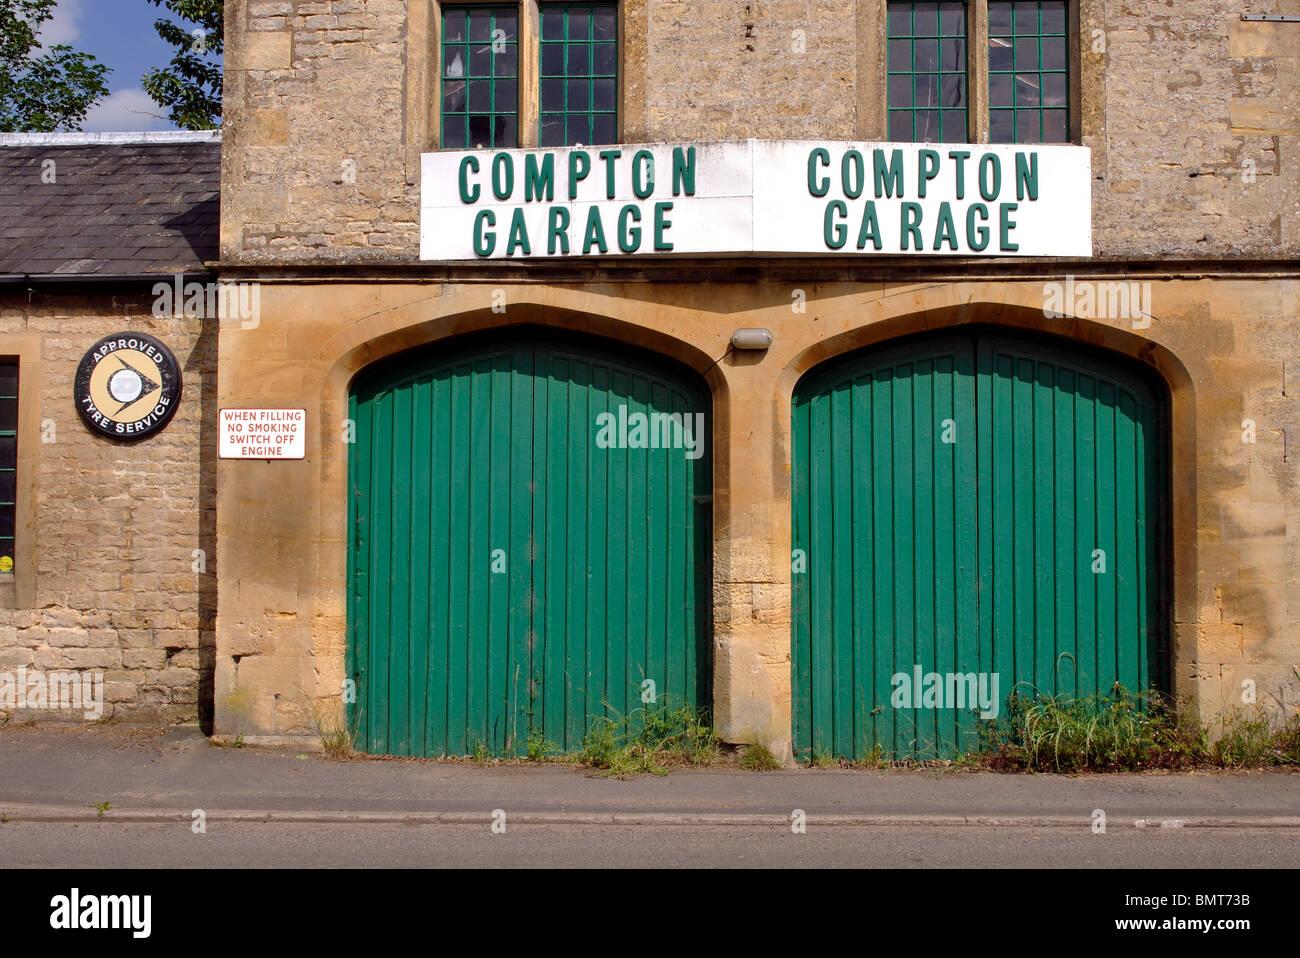 Compton Garage, Long Compton, Warwickshire, England, UK - Stock Image